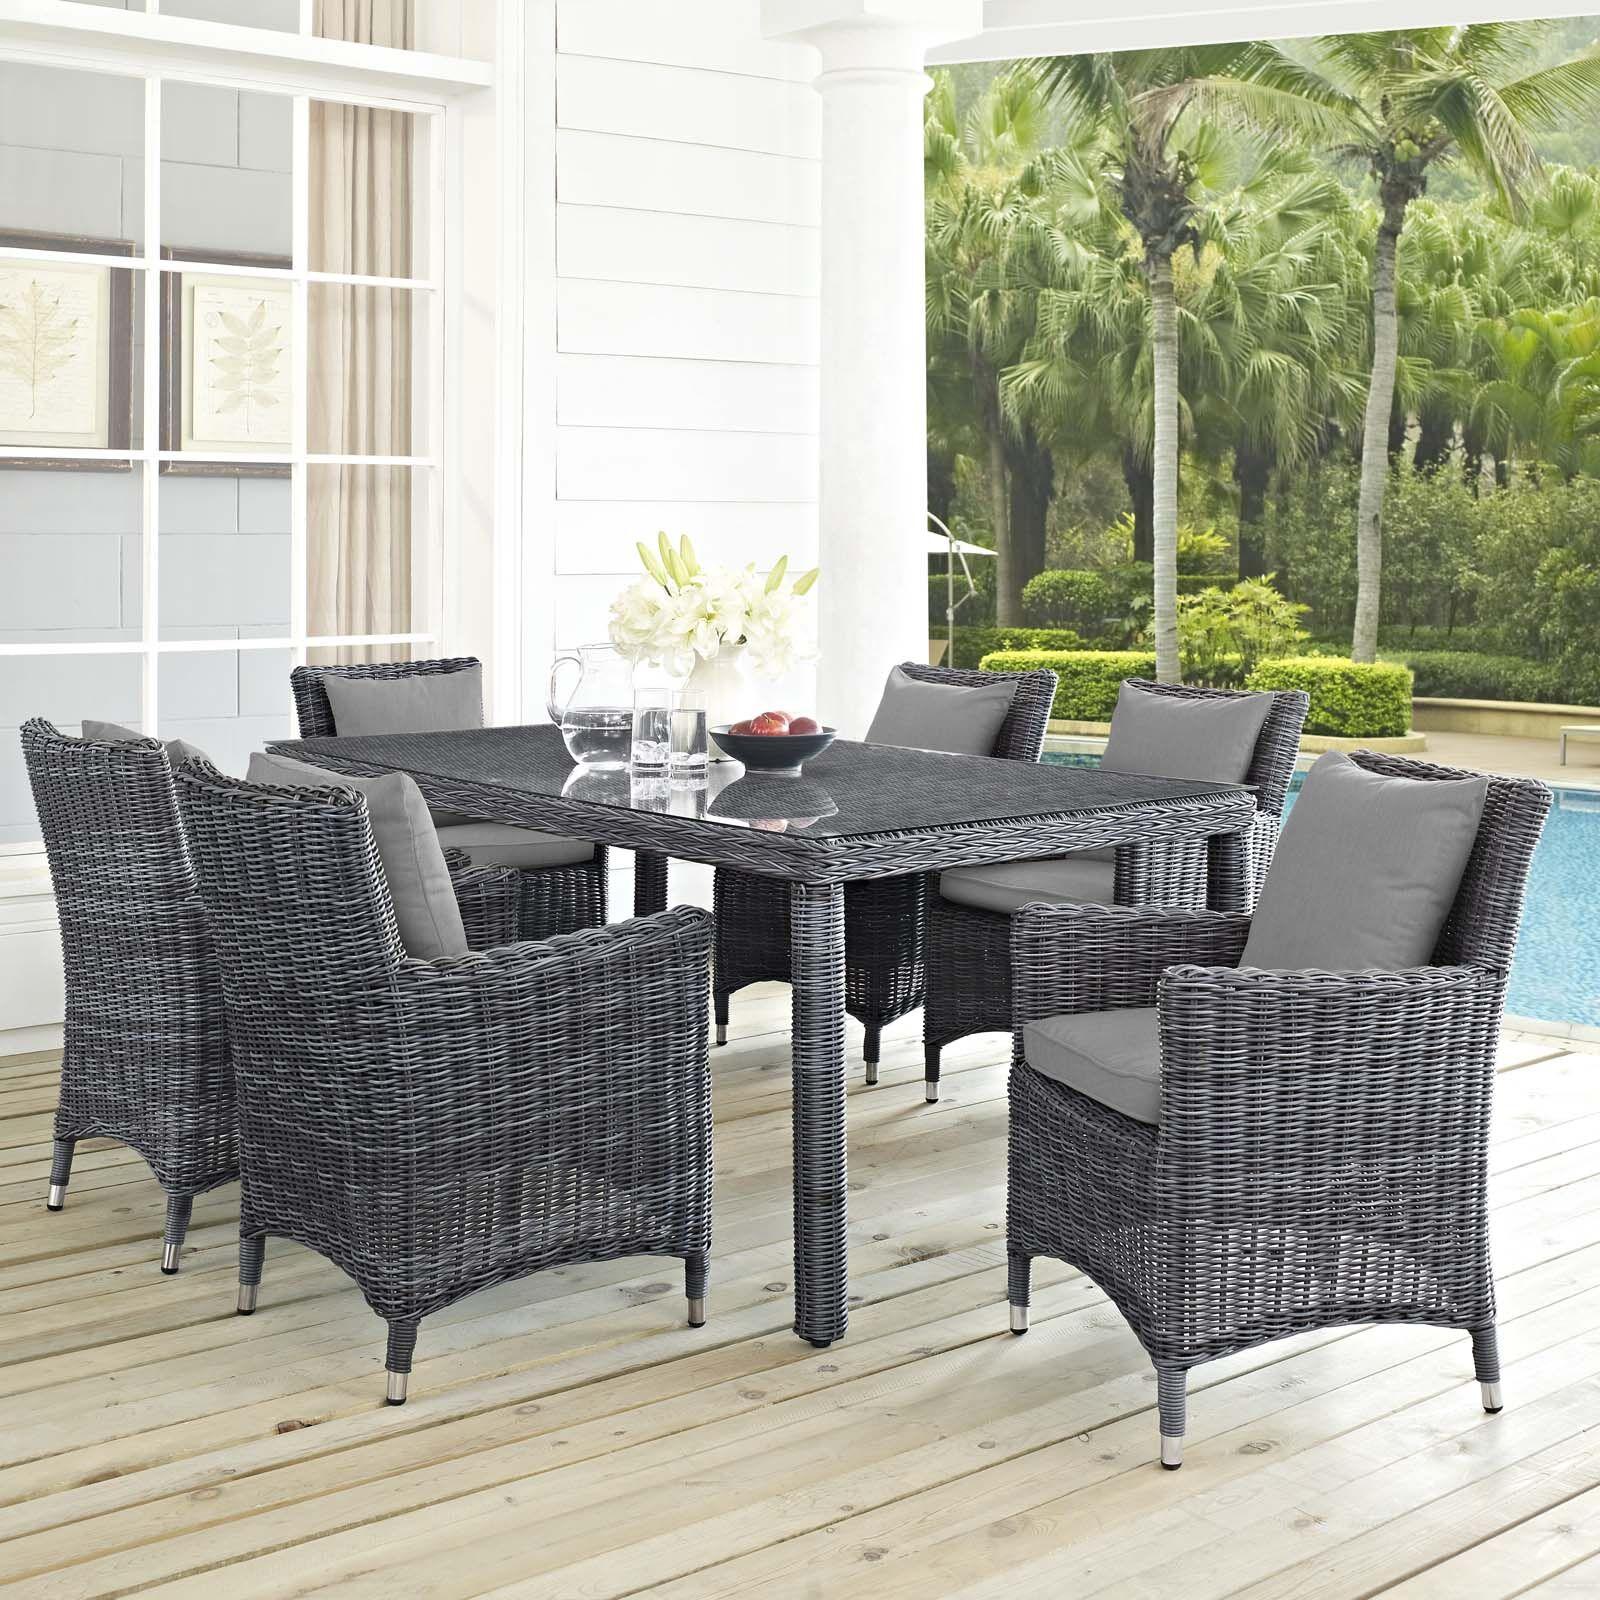 Alaia 7 Piece Rattan Sunbrella Dining Set with Cushions Cushion Color: Gray